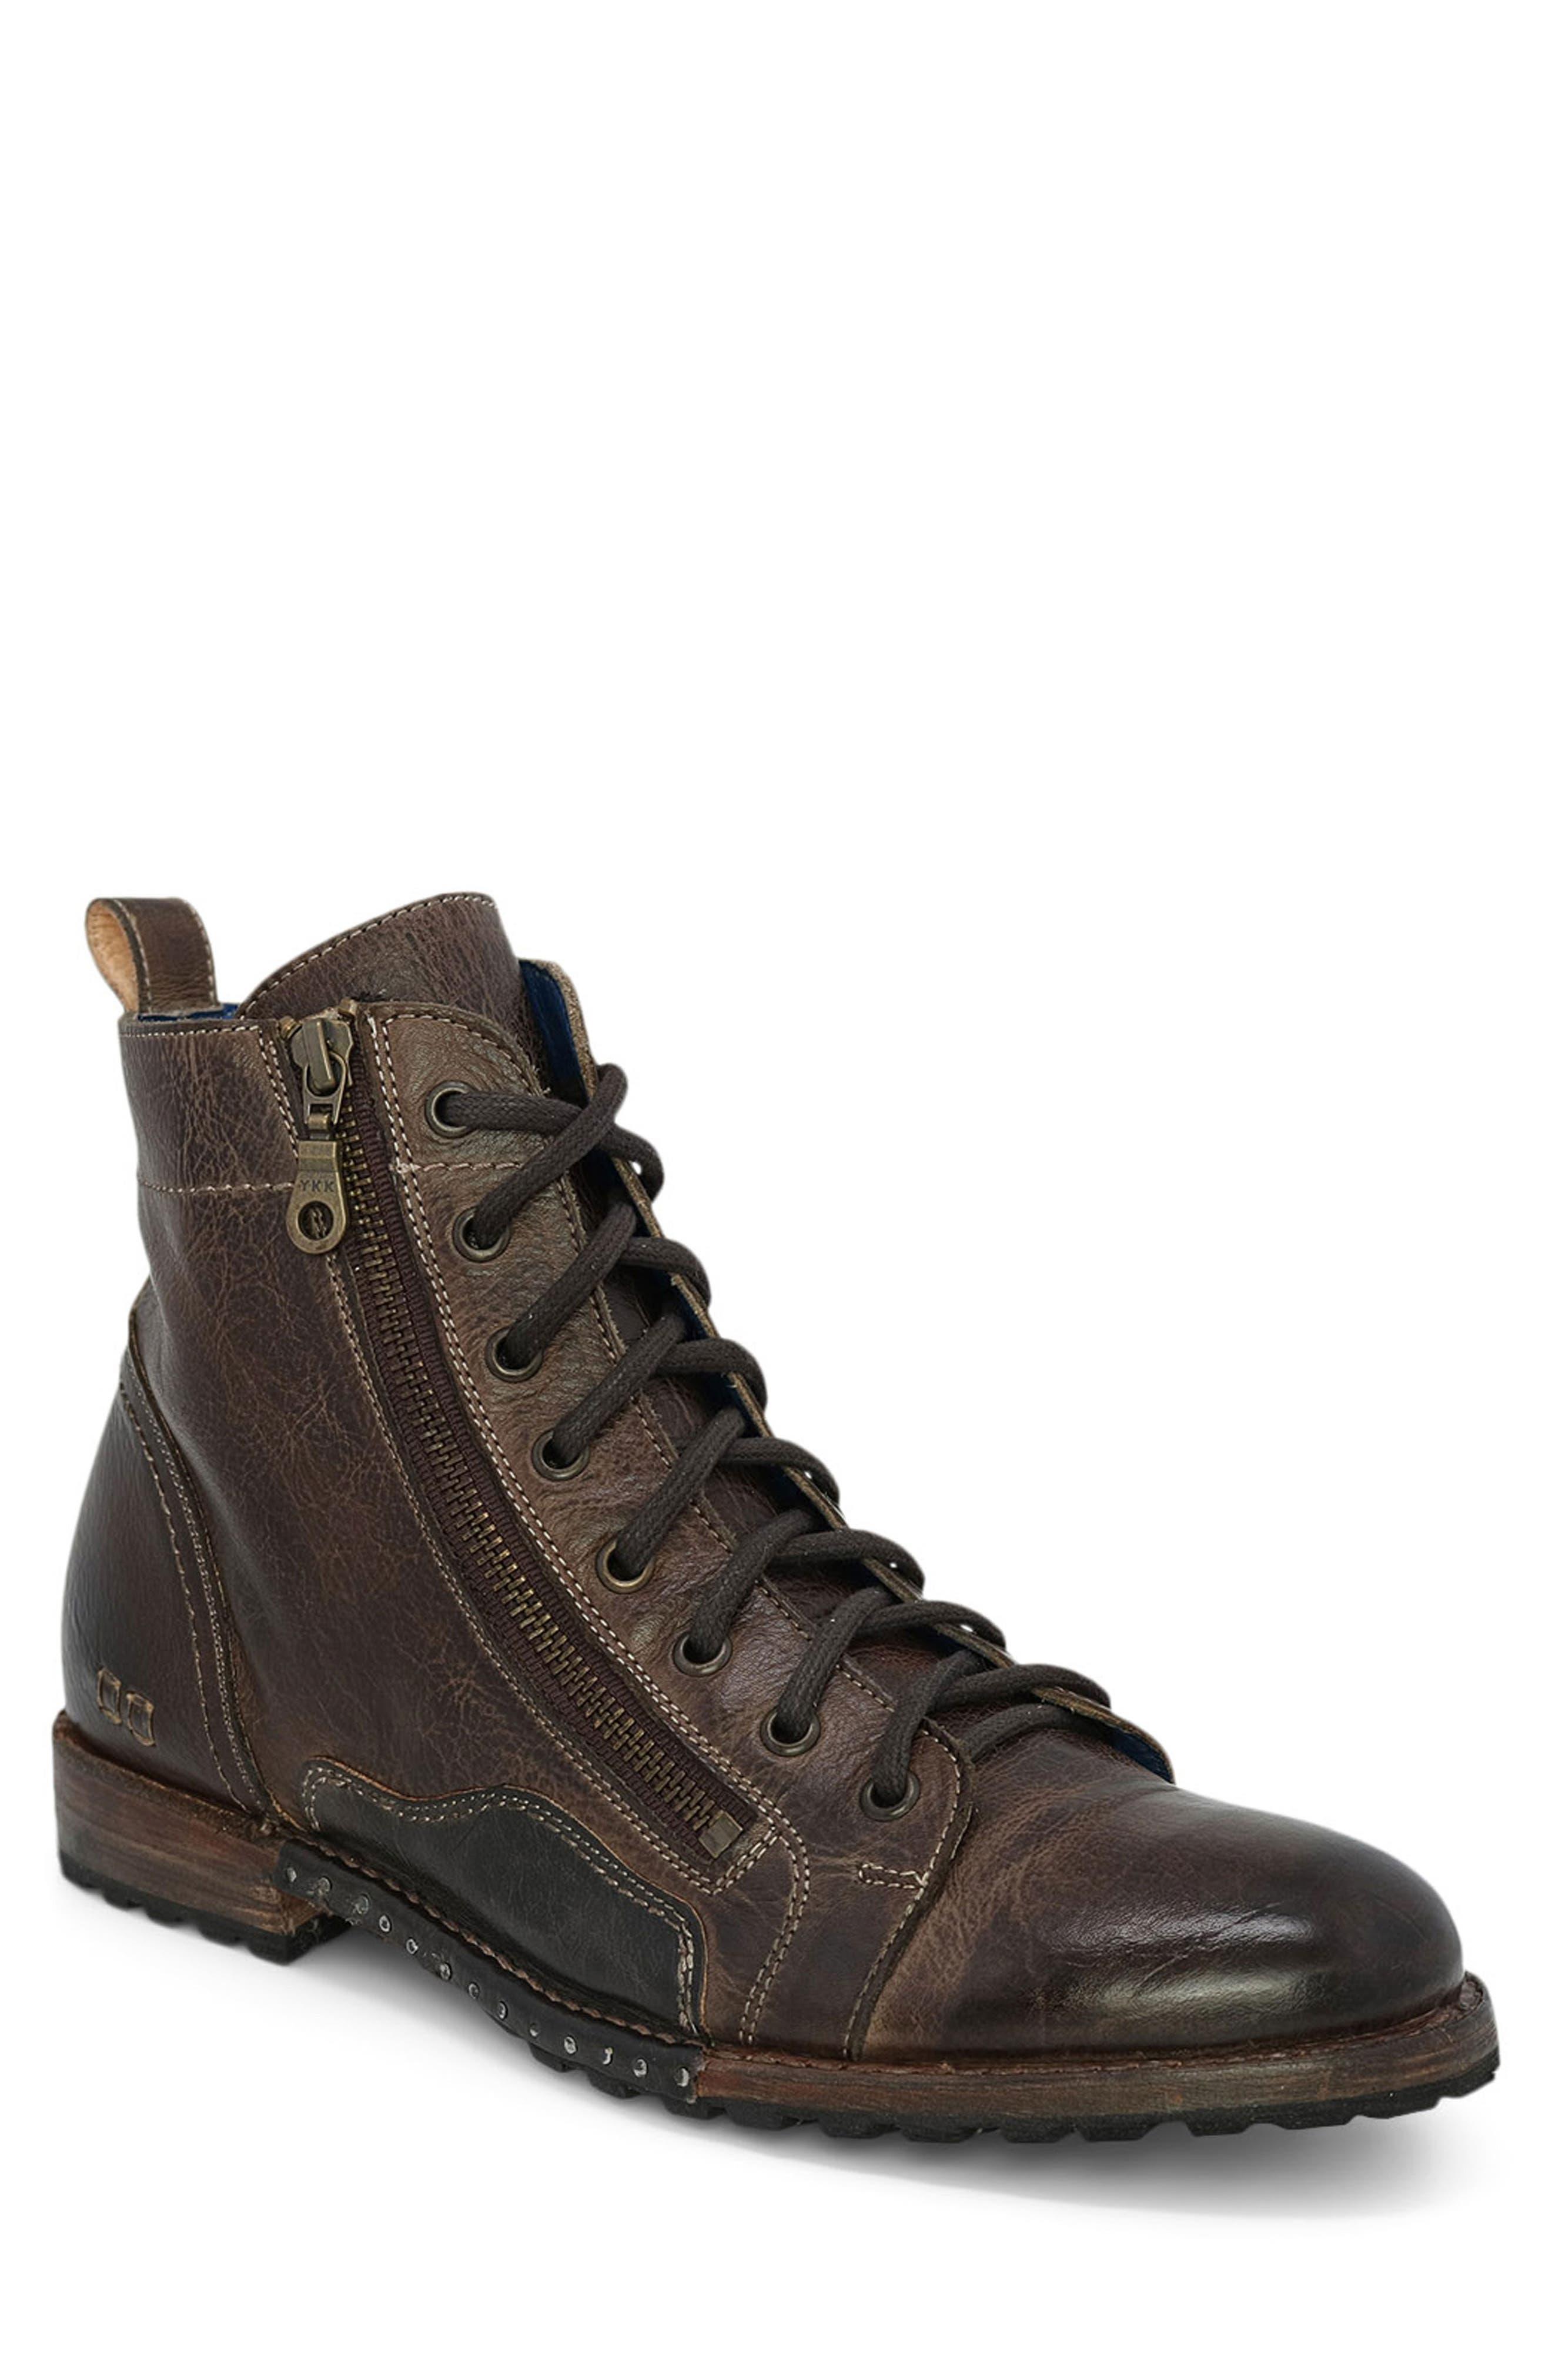 Old Bowen Plain Toe Boot